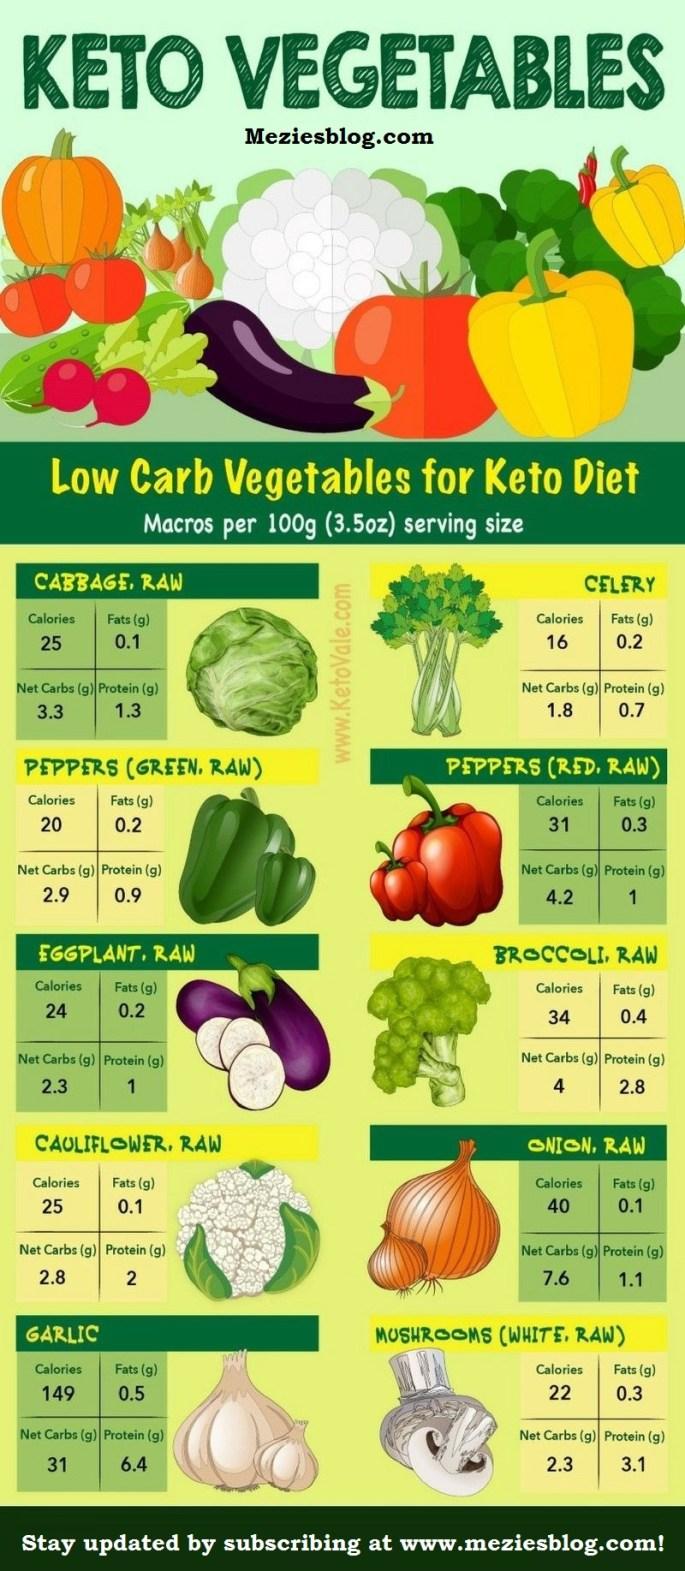 Keto veggies.jpg